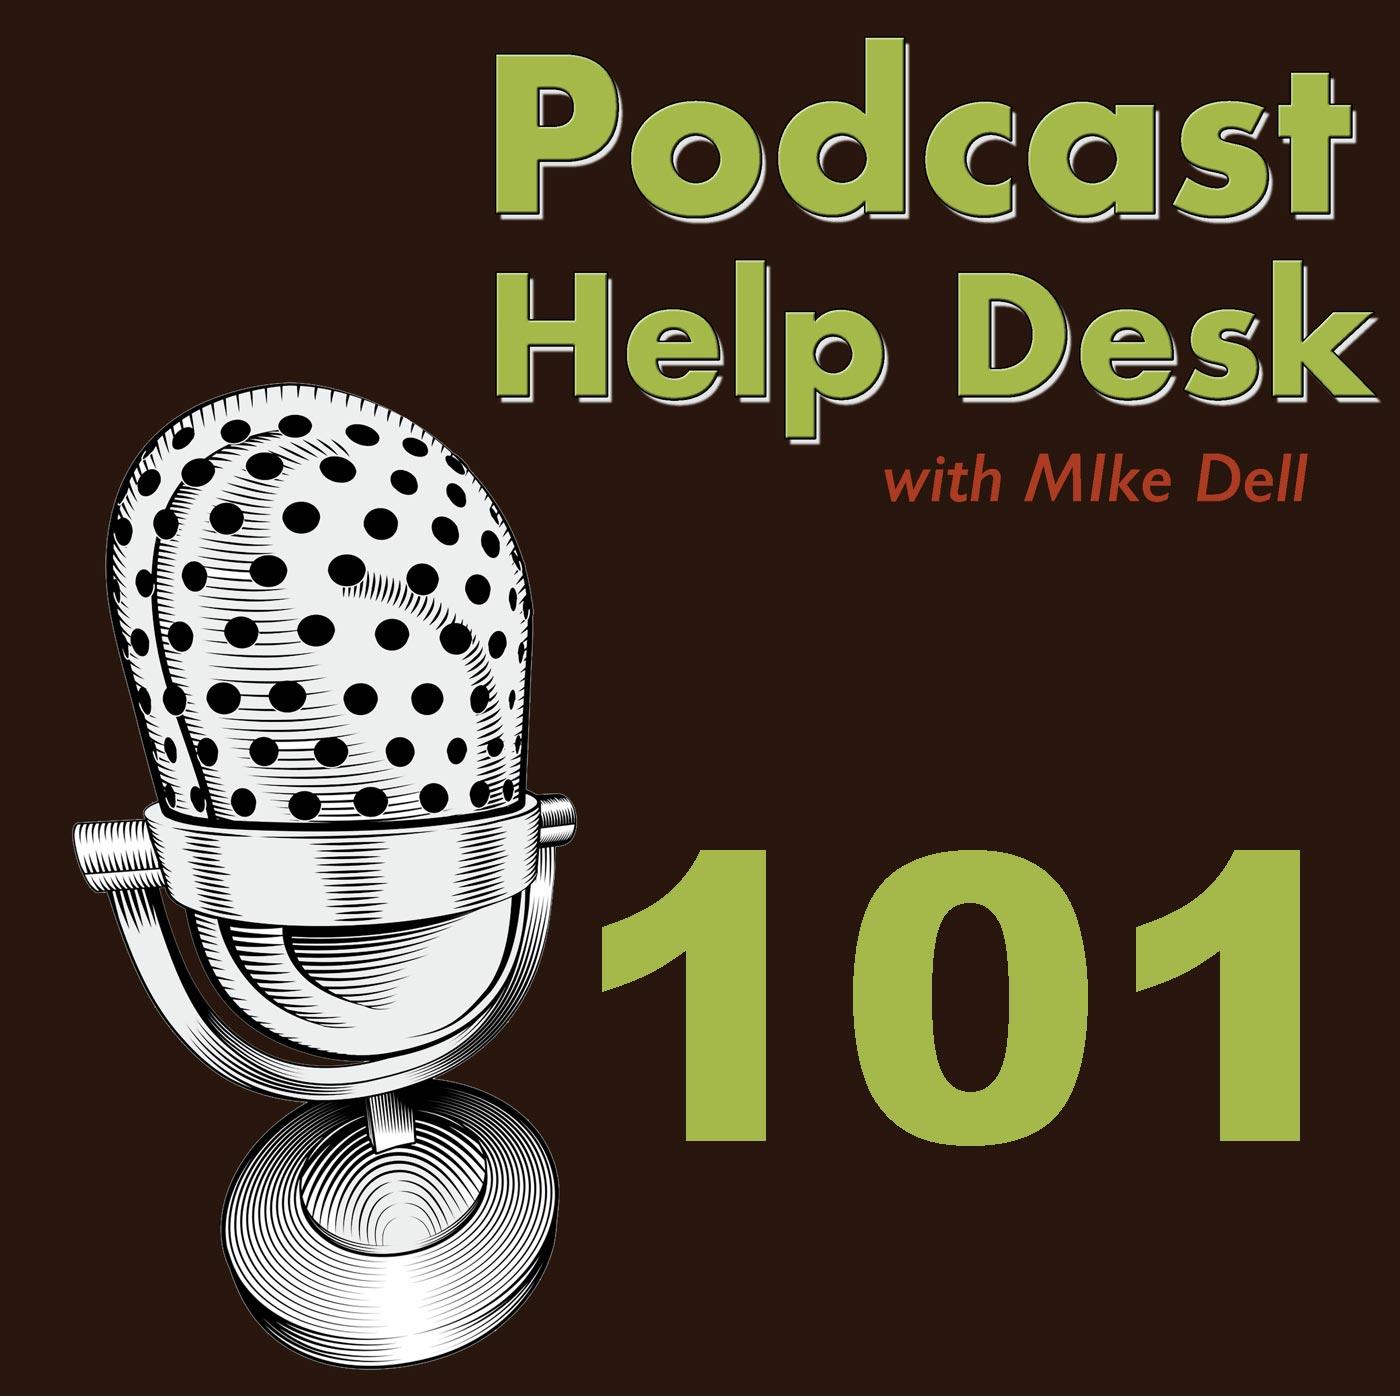 Podcast Help Desk™